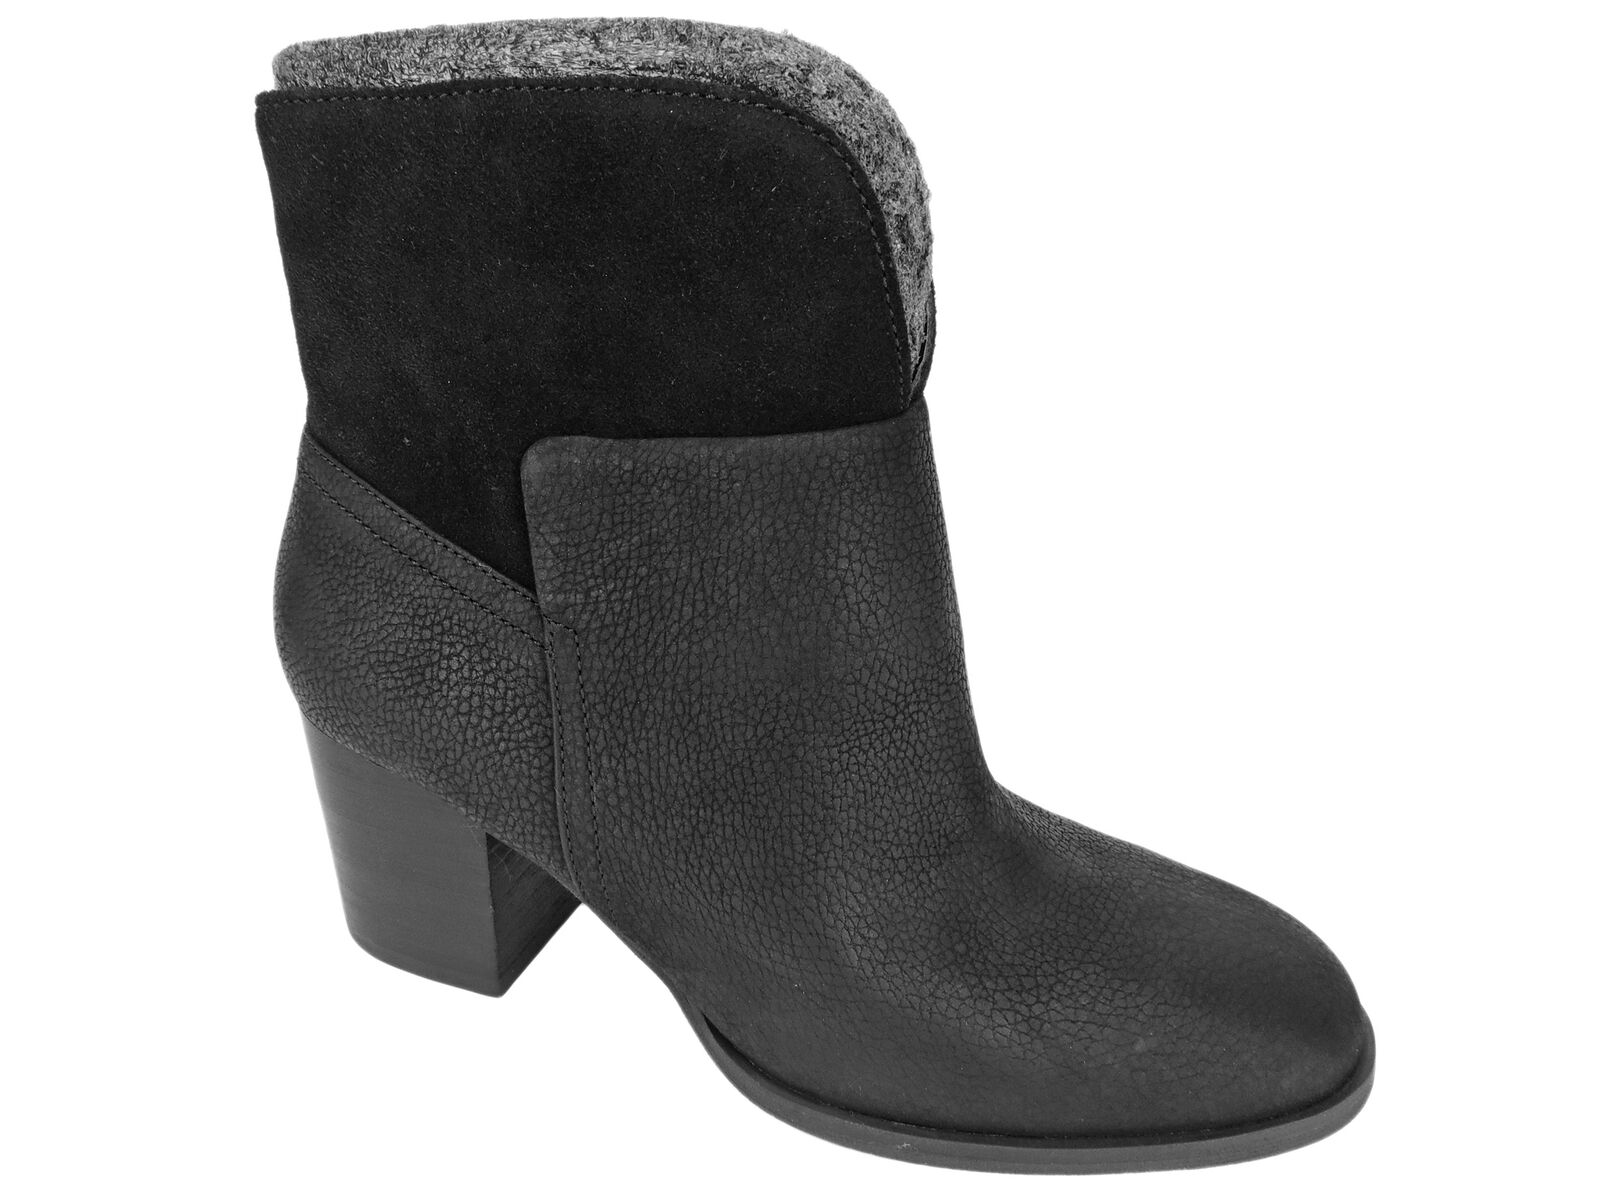 Nine West Women's Dale Block-Heel Booties Black Ankle Boots Size 7.5 M